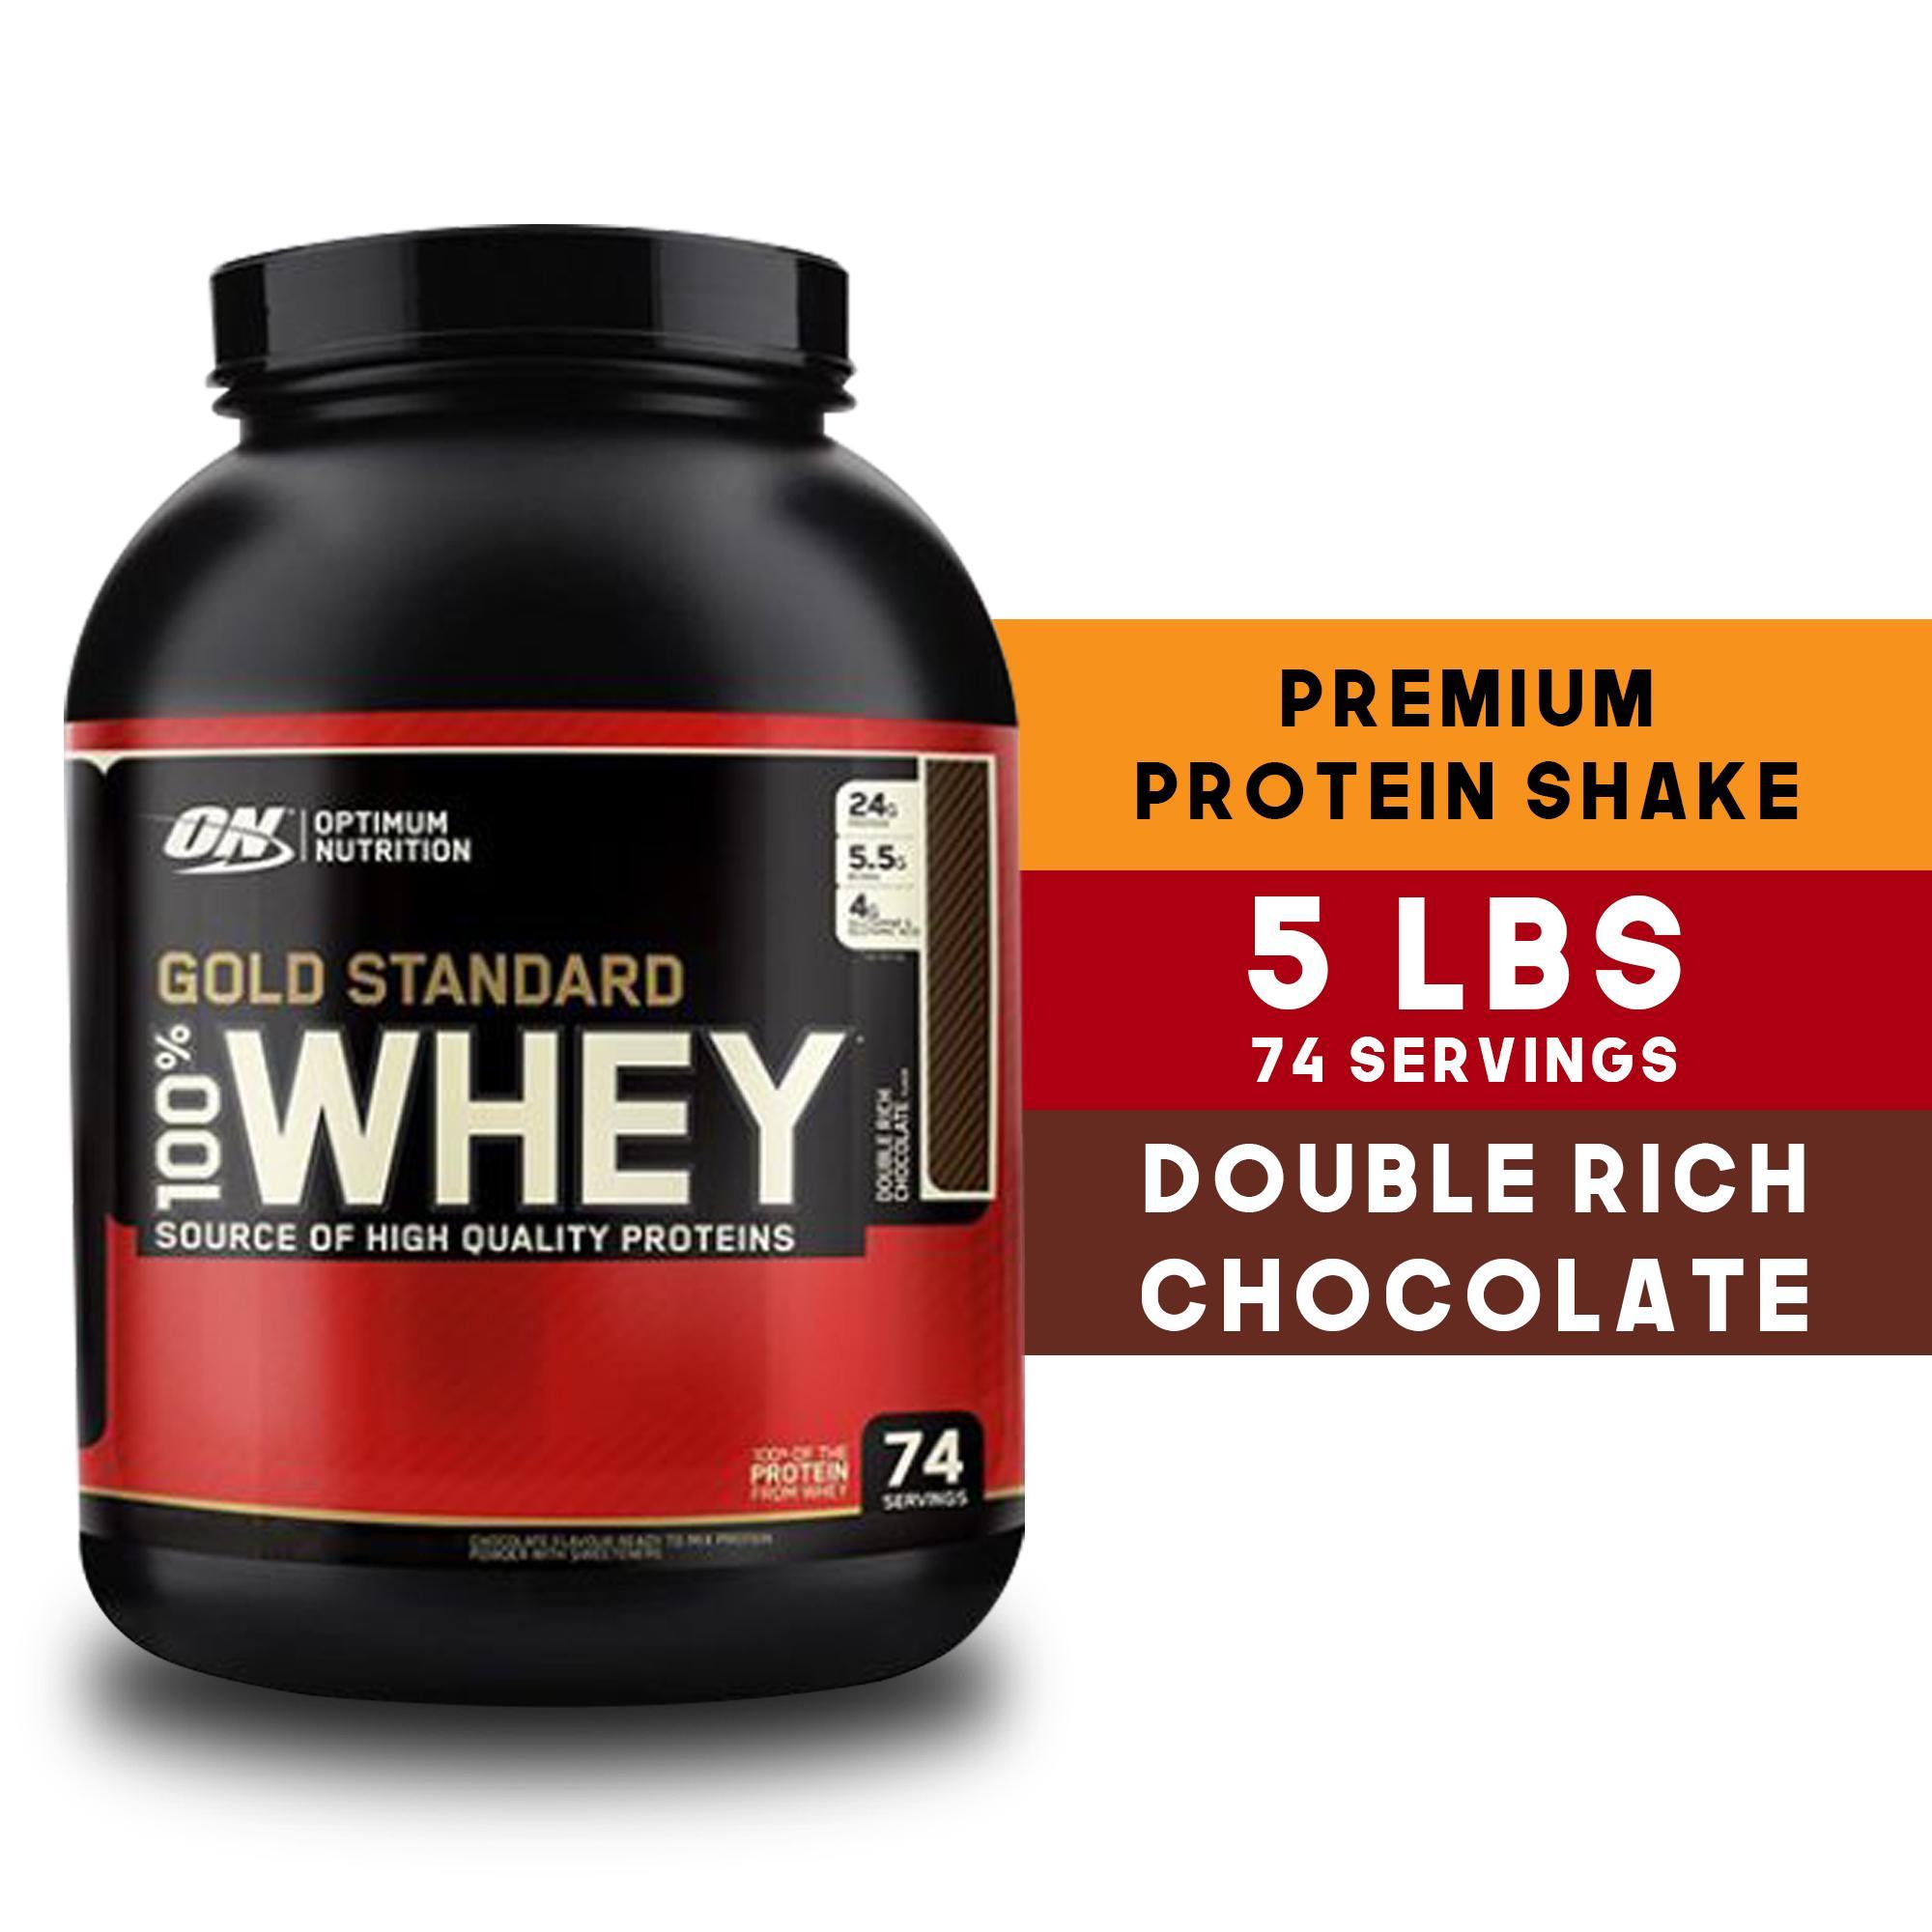 ba0643e33 Optimum Nutrition Gold Standard 100% Whey - 5lbs - Double Rich Chocolate